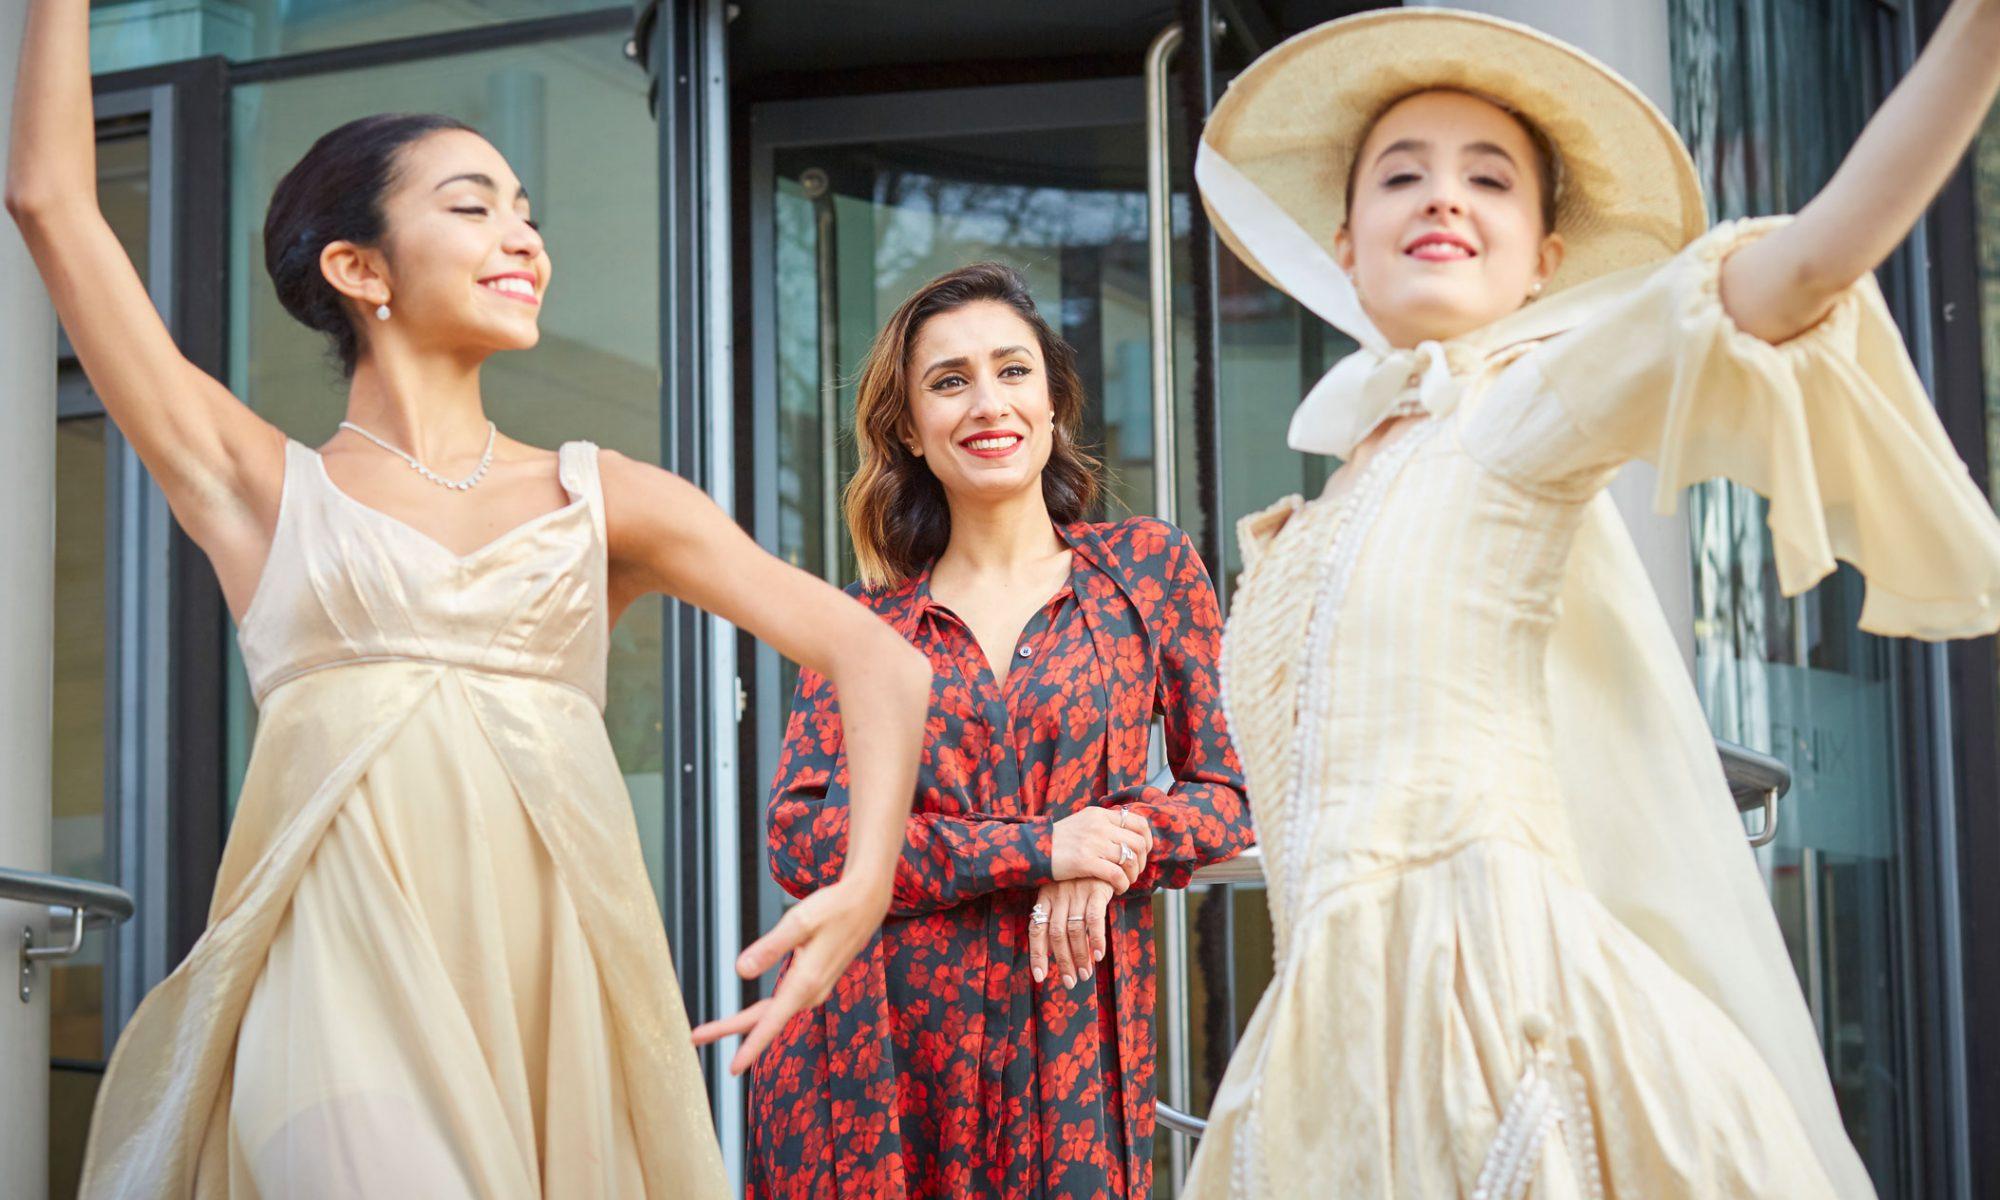 Anita Rani with Northern Ballet dancer Natalia Kerner and Kiara Flavin at Northern Ballet's Leeds HQ. Photo Justin Slee